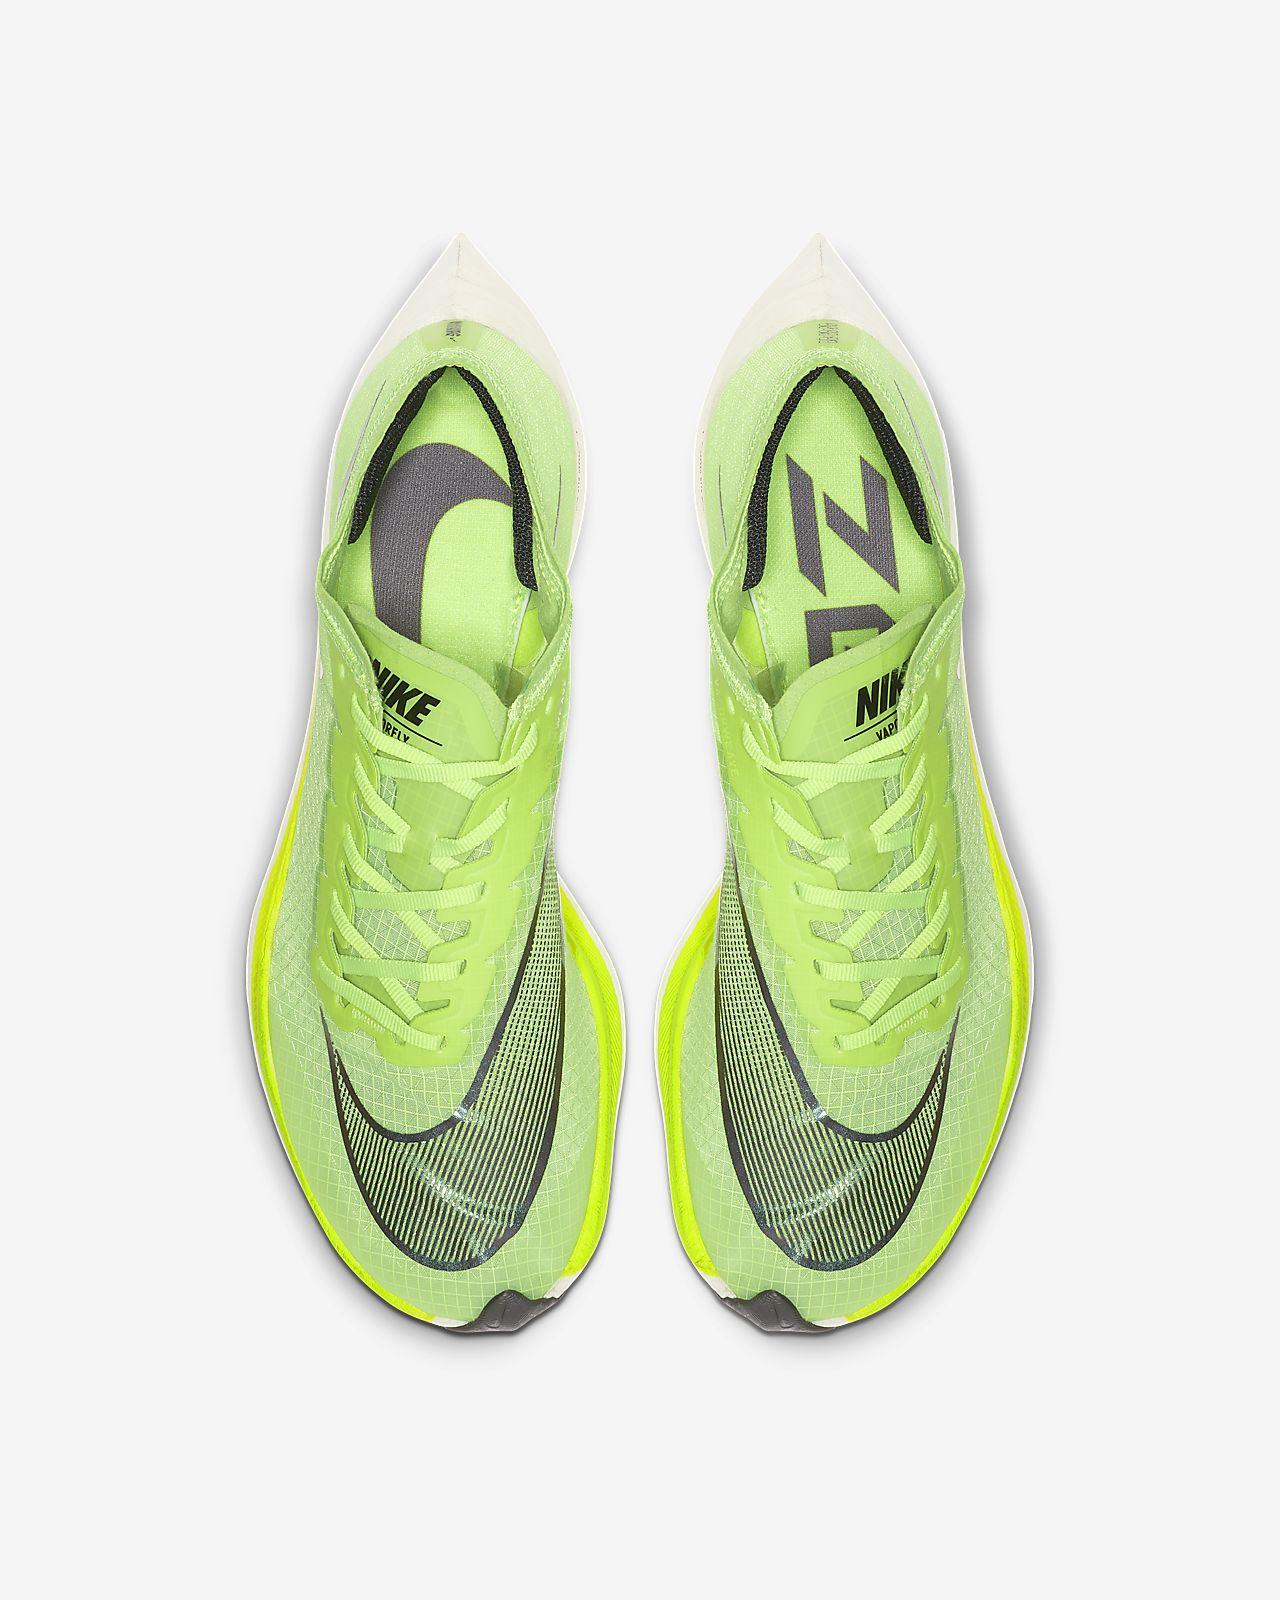 Vaporfly Nike Zoomx Chaussure Next Running De rxhCsdtQ